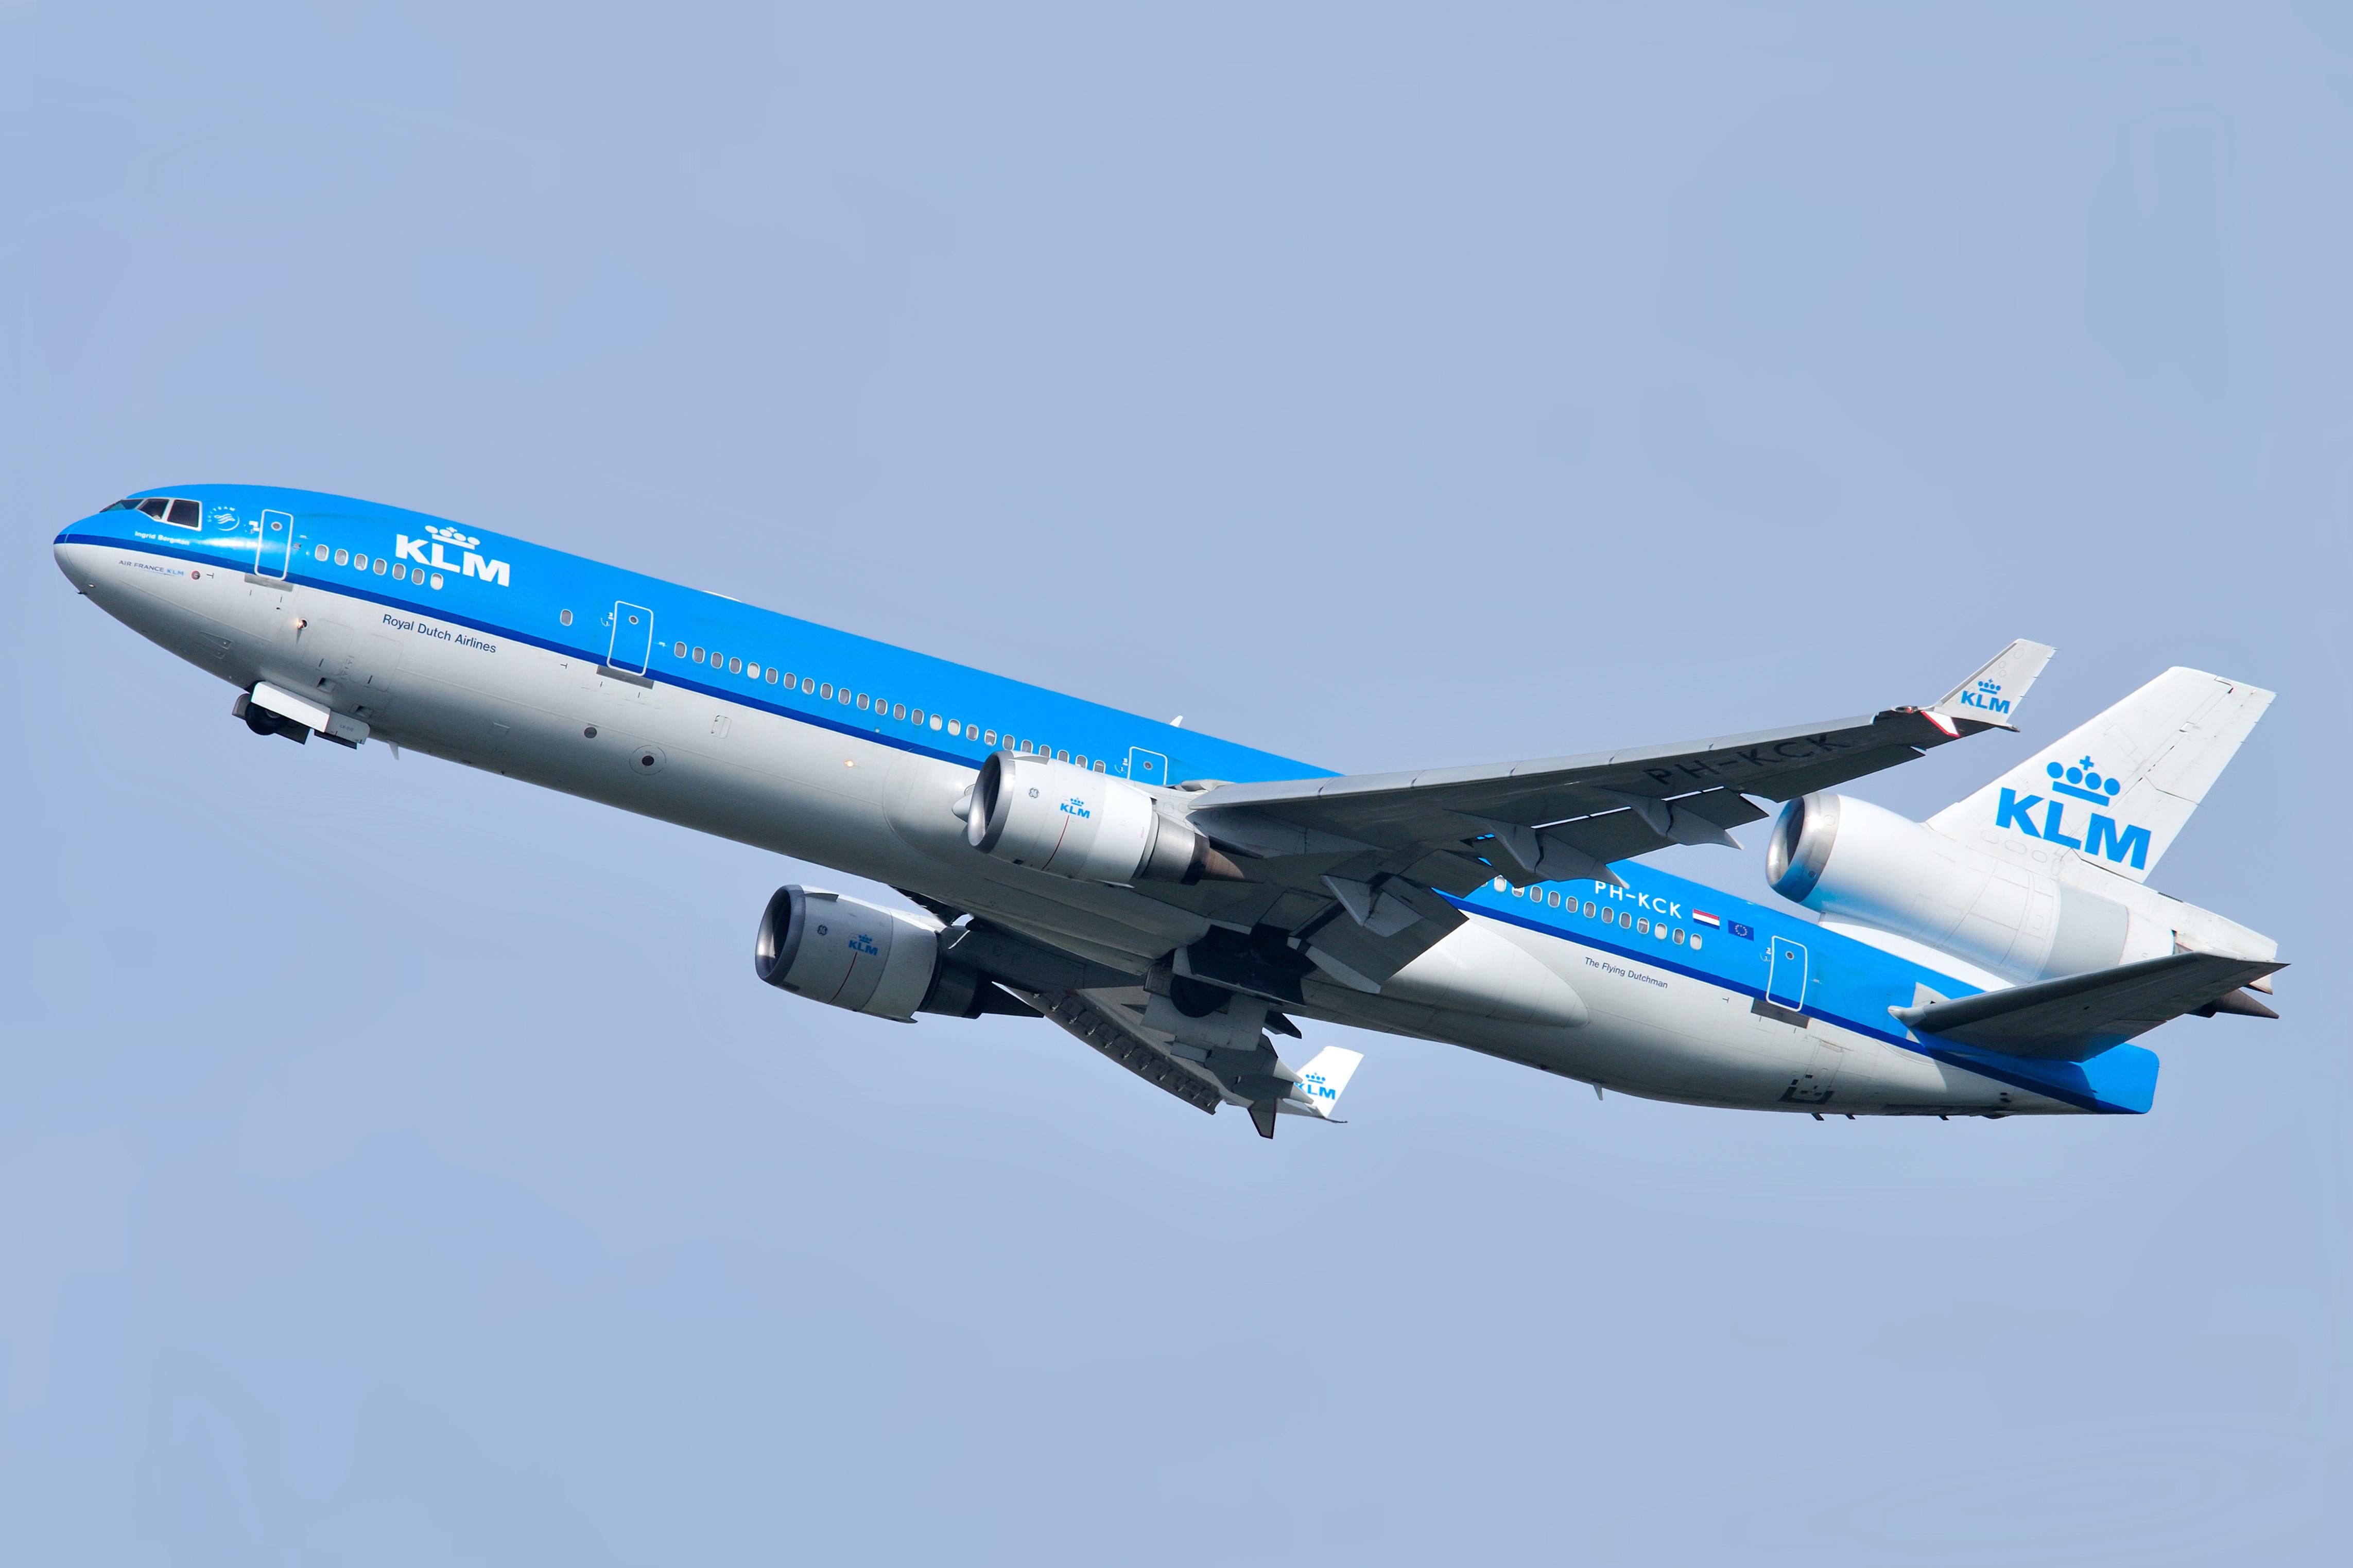 http://upload.wikimedia.org/wikipedia/commons/3/36/KLM_McDonnell_Douglas_MD-11_PH-KCK_Ingrid_Bergman.jpg